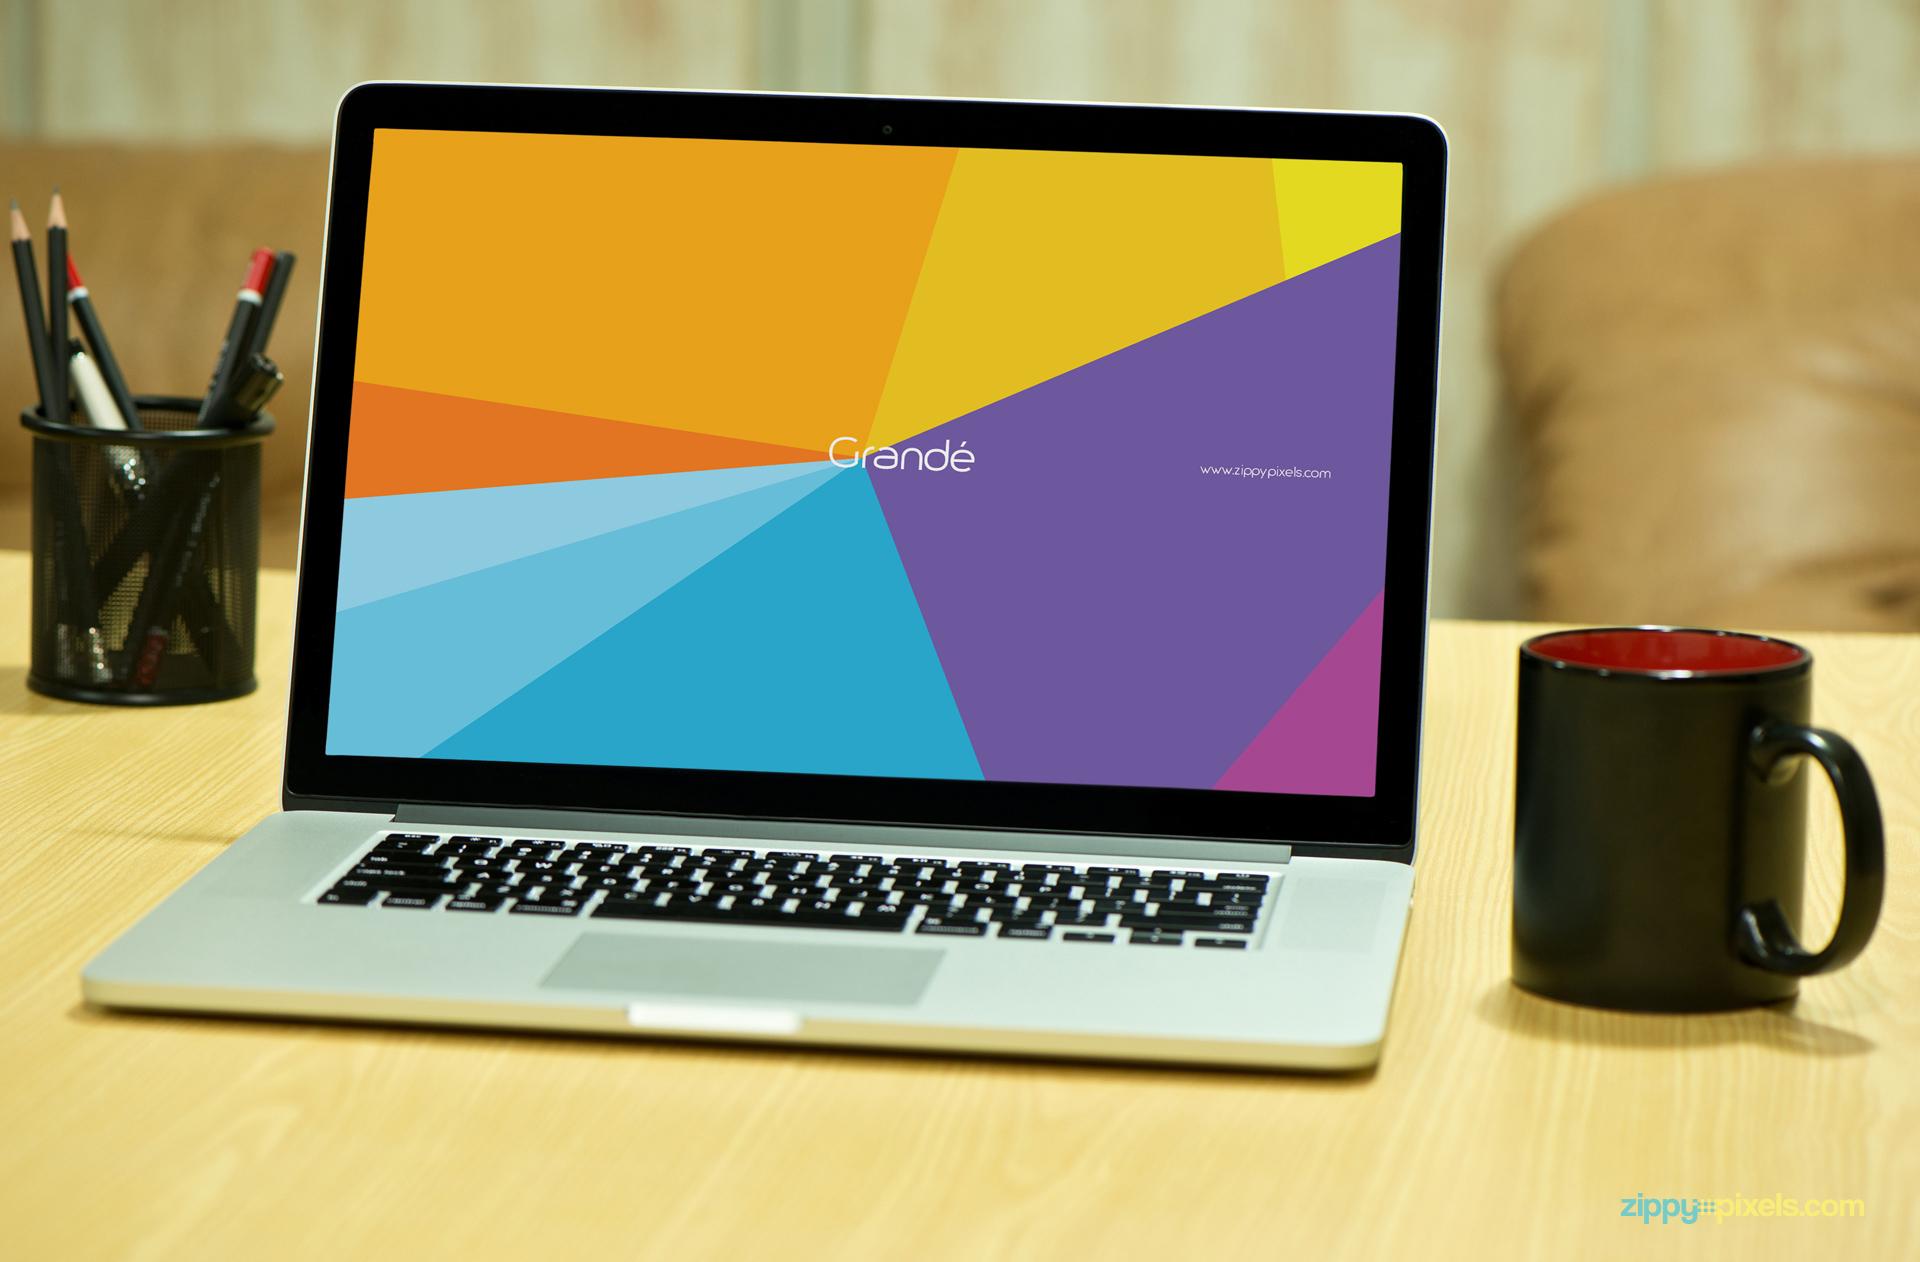 Macbook Pro with Black mug on Table for Mockup